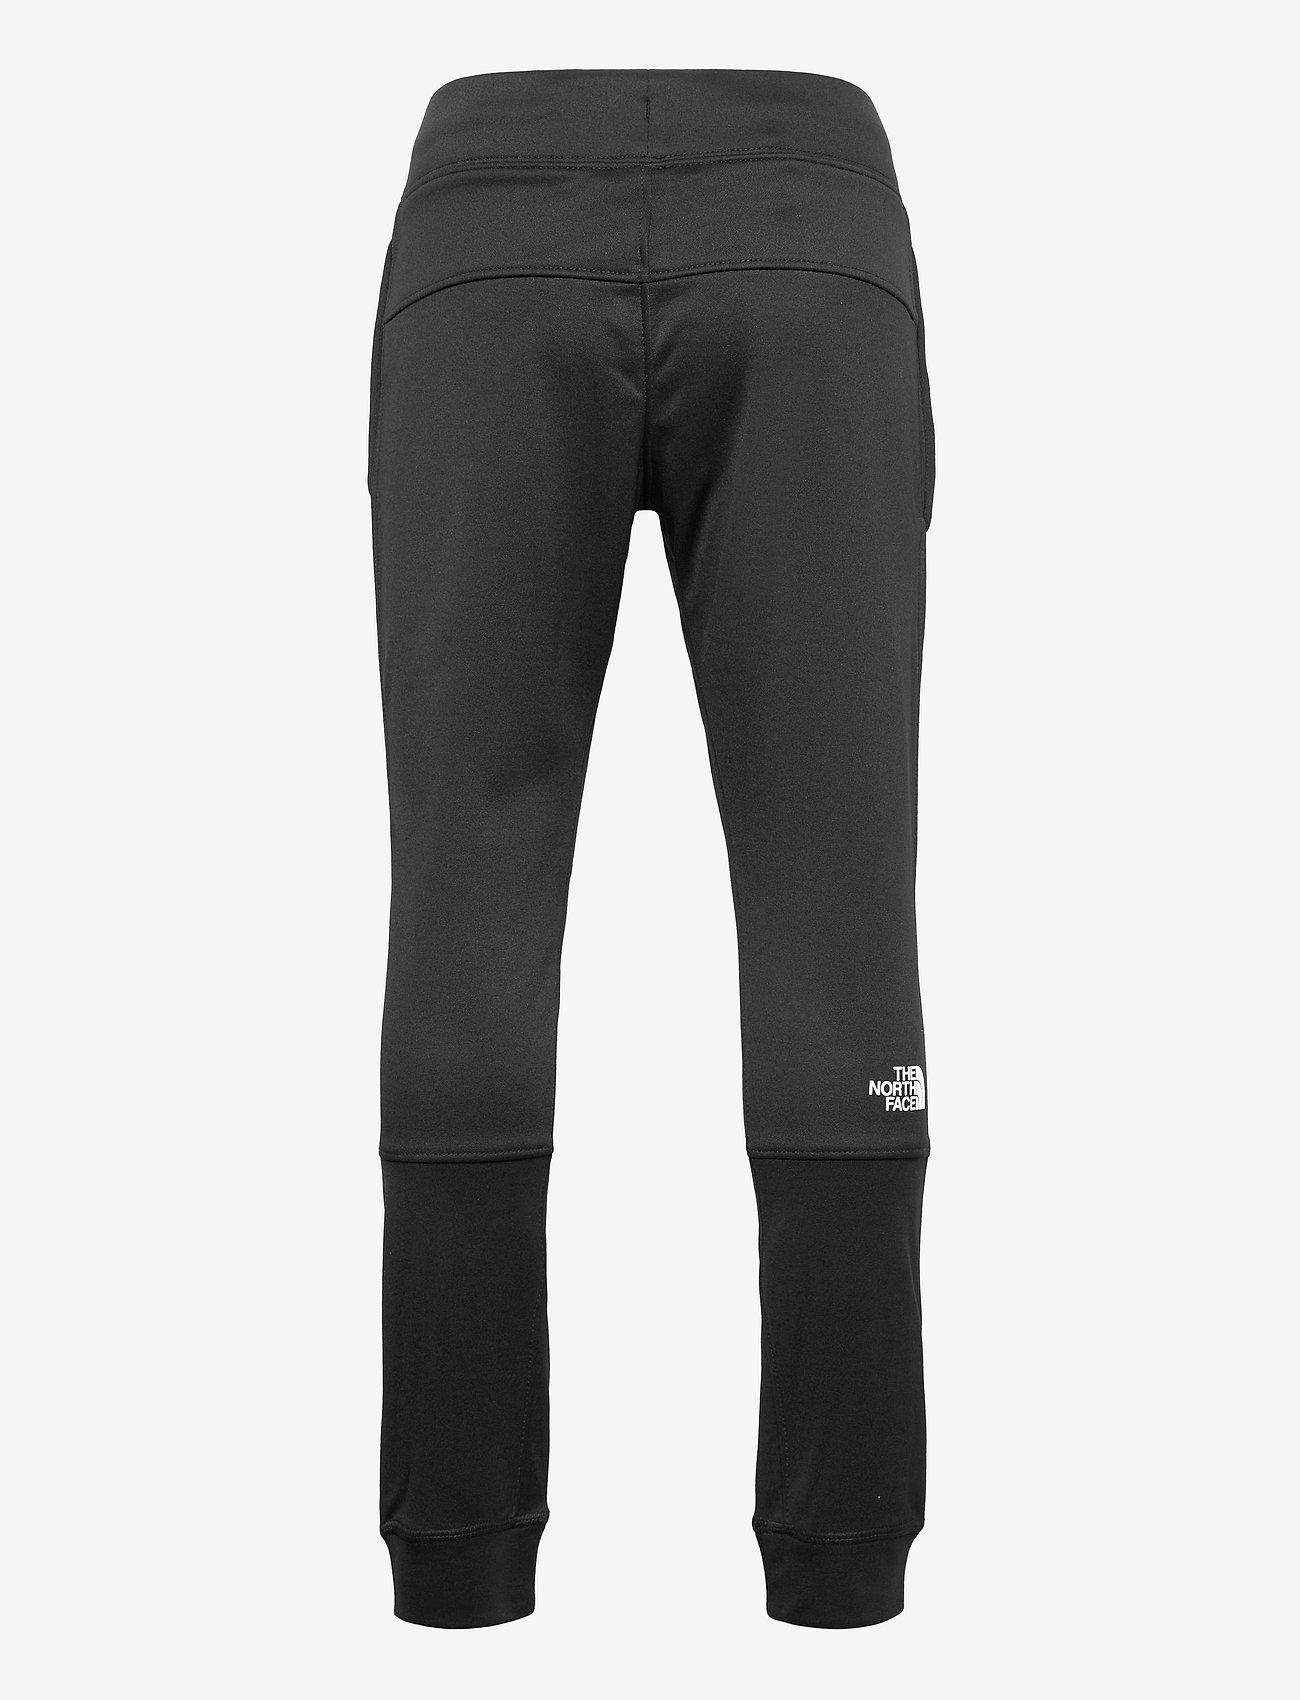 The North Face - Y SURGENT PANT - wandelbroeken - tnf black - 1